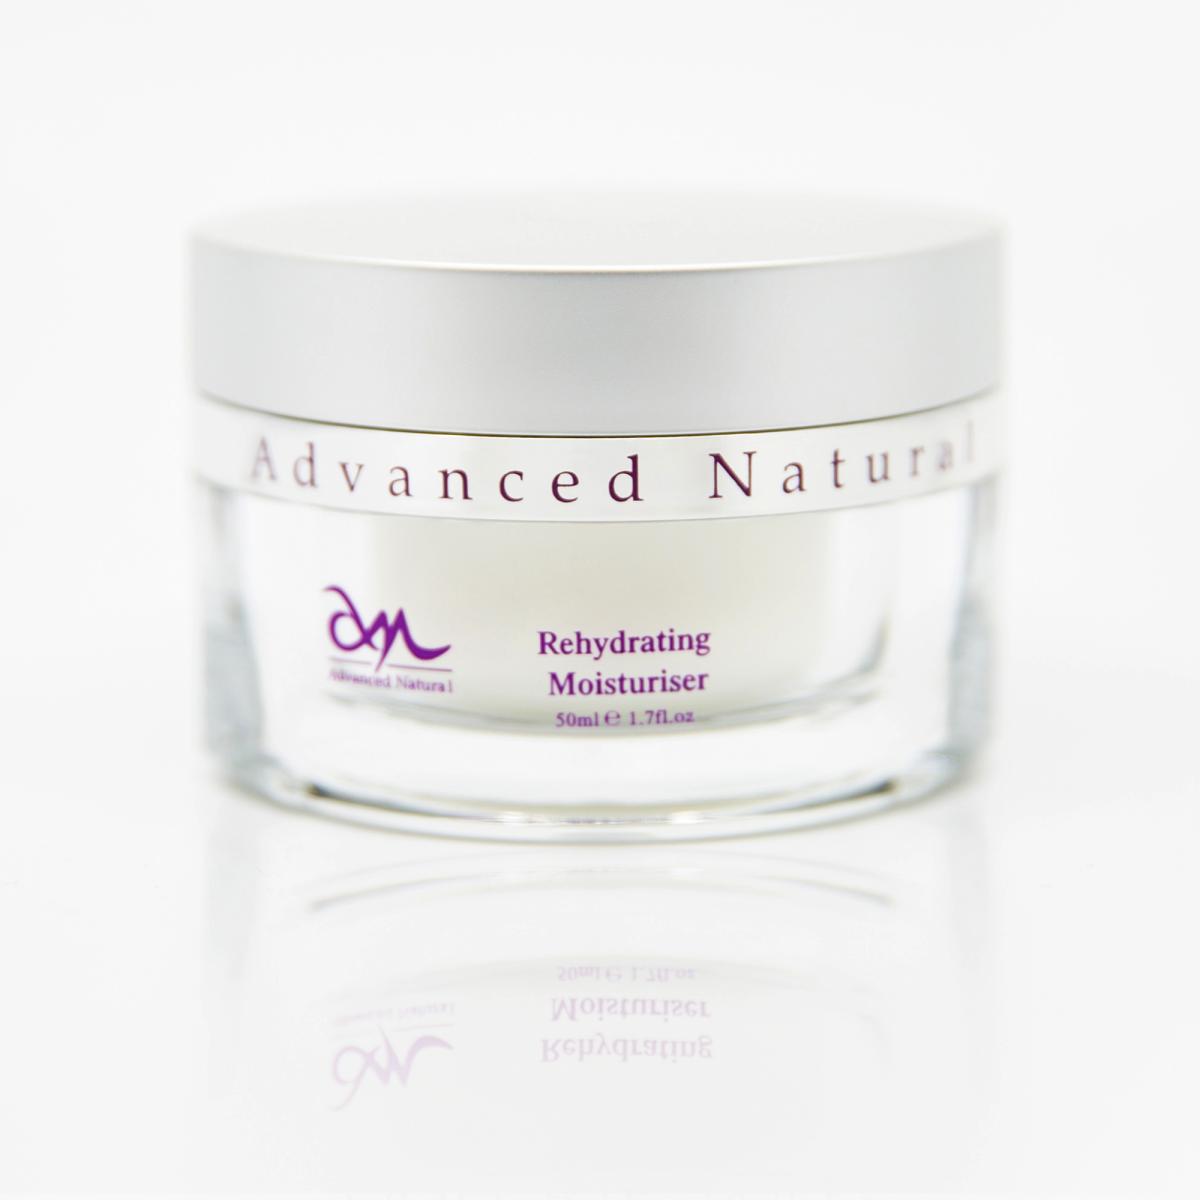 Advanced Natural Skin Care Rehydrating Moisturiser Регидрирующий увлажняющий крем для лица